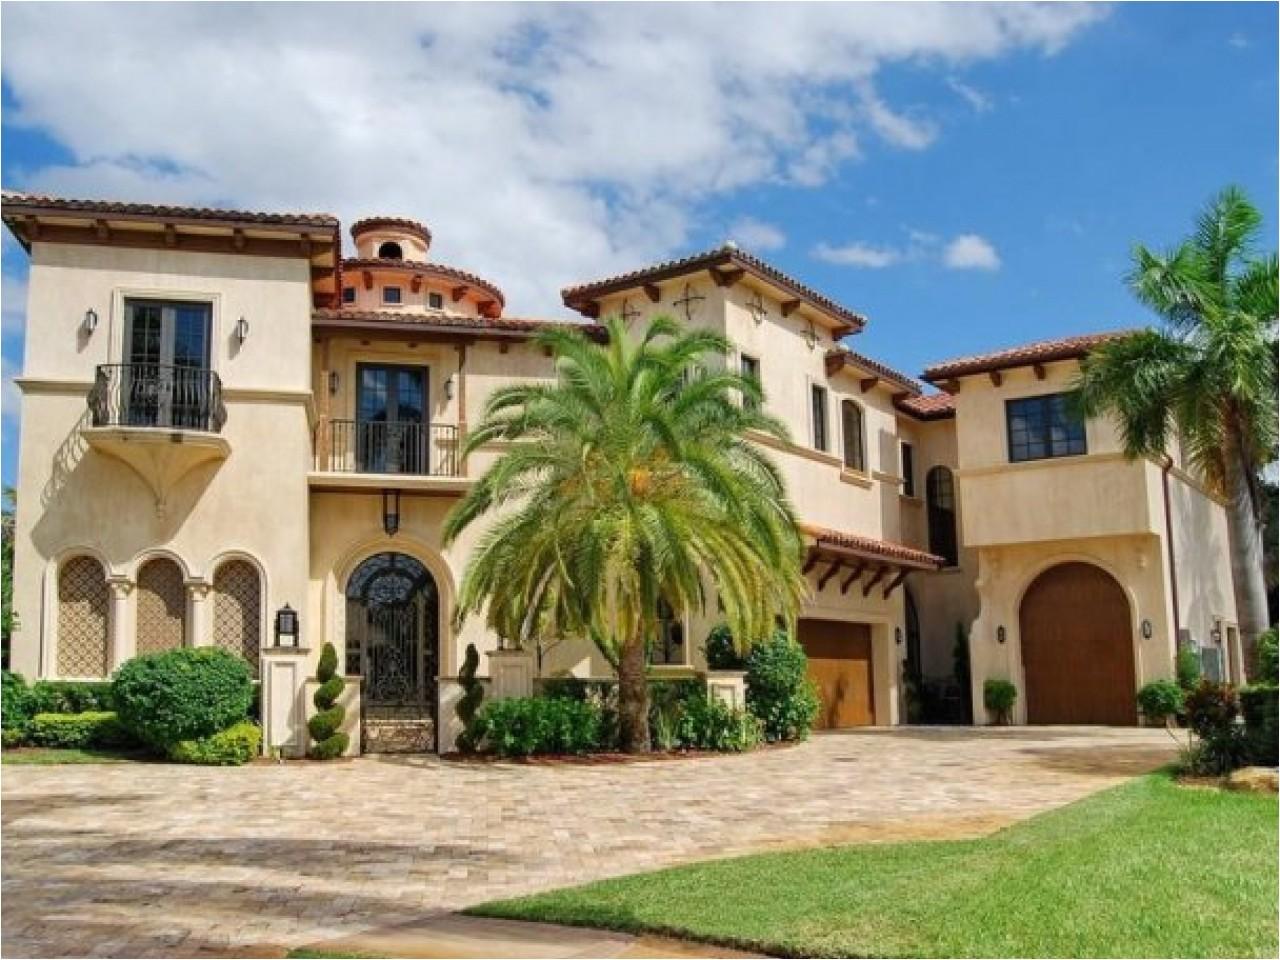 6419f217383d127c mediterranean style homes spanish mediterranean style house